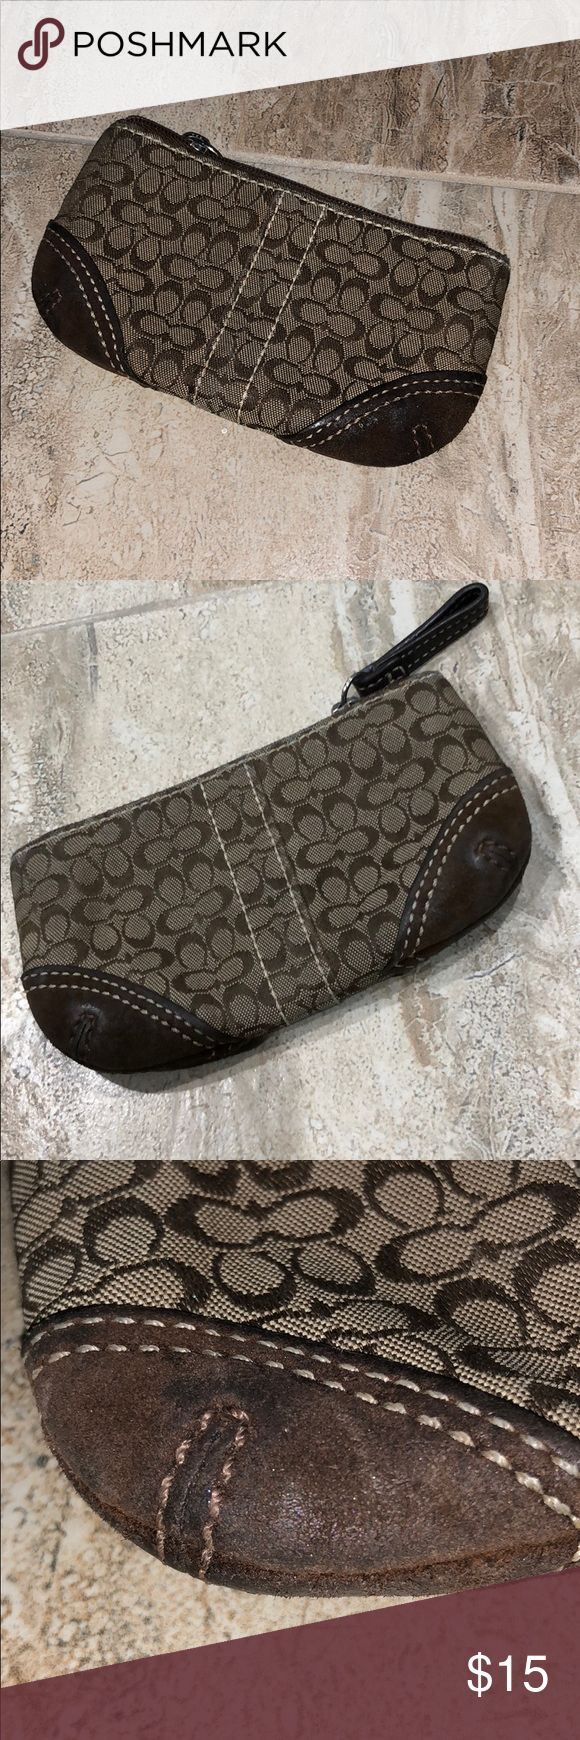 Coach wallet Coach wallet Coach Bags Wallets